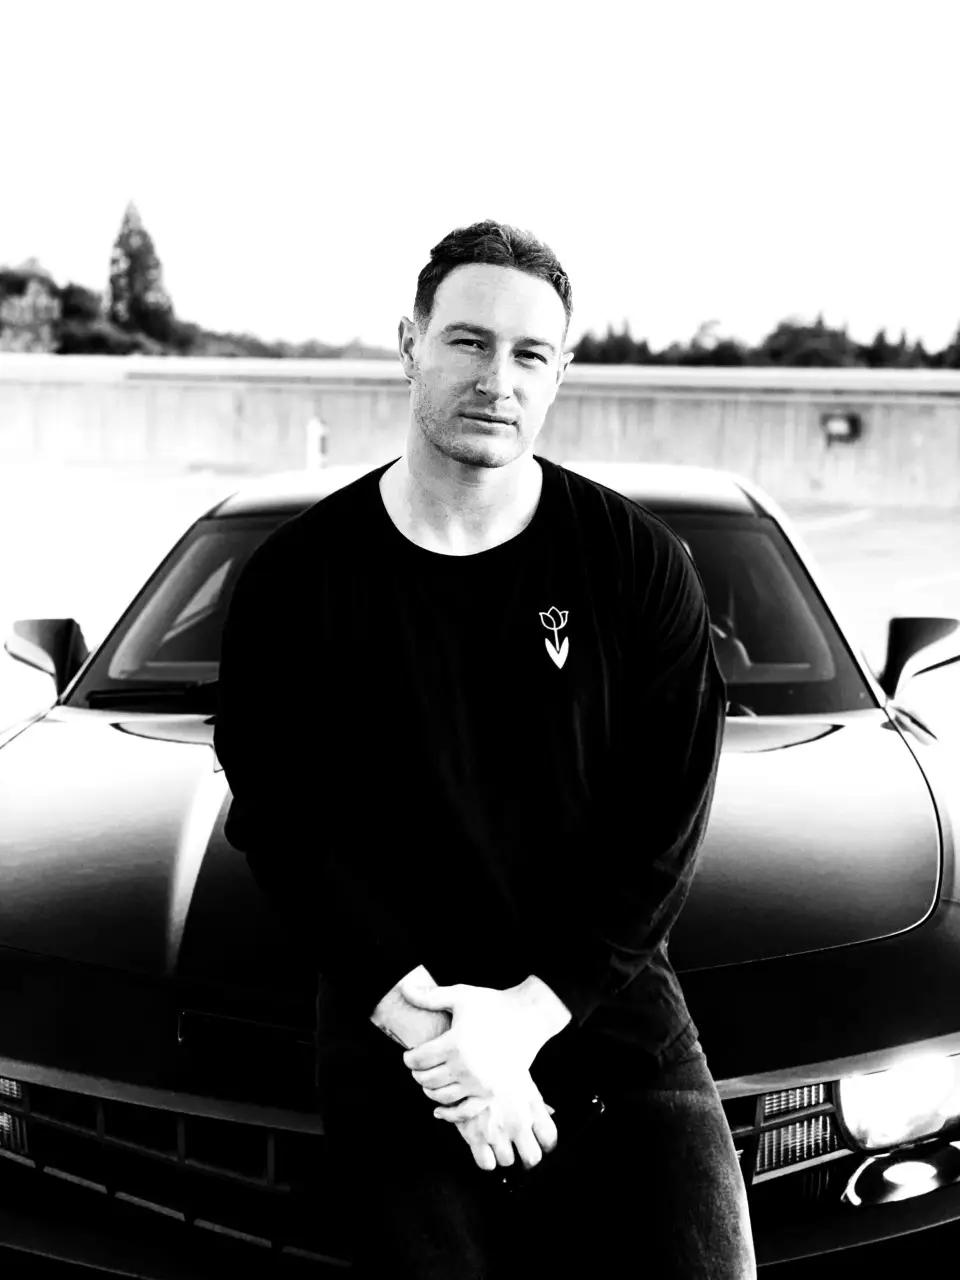 Hidden Gem Coming Out Of The Sacramento Area, Professional Athlete Now Hip Hop/Rap Artist